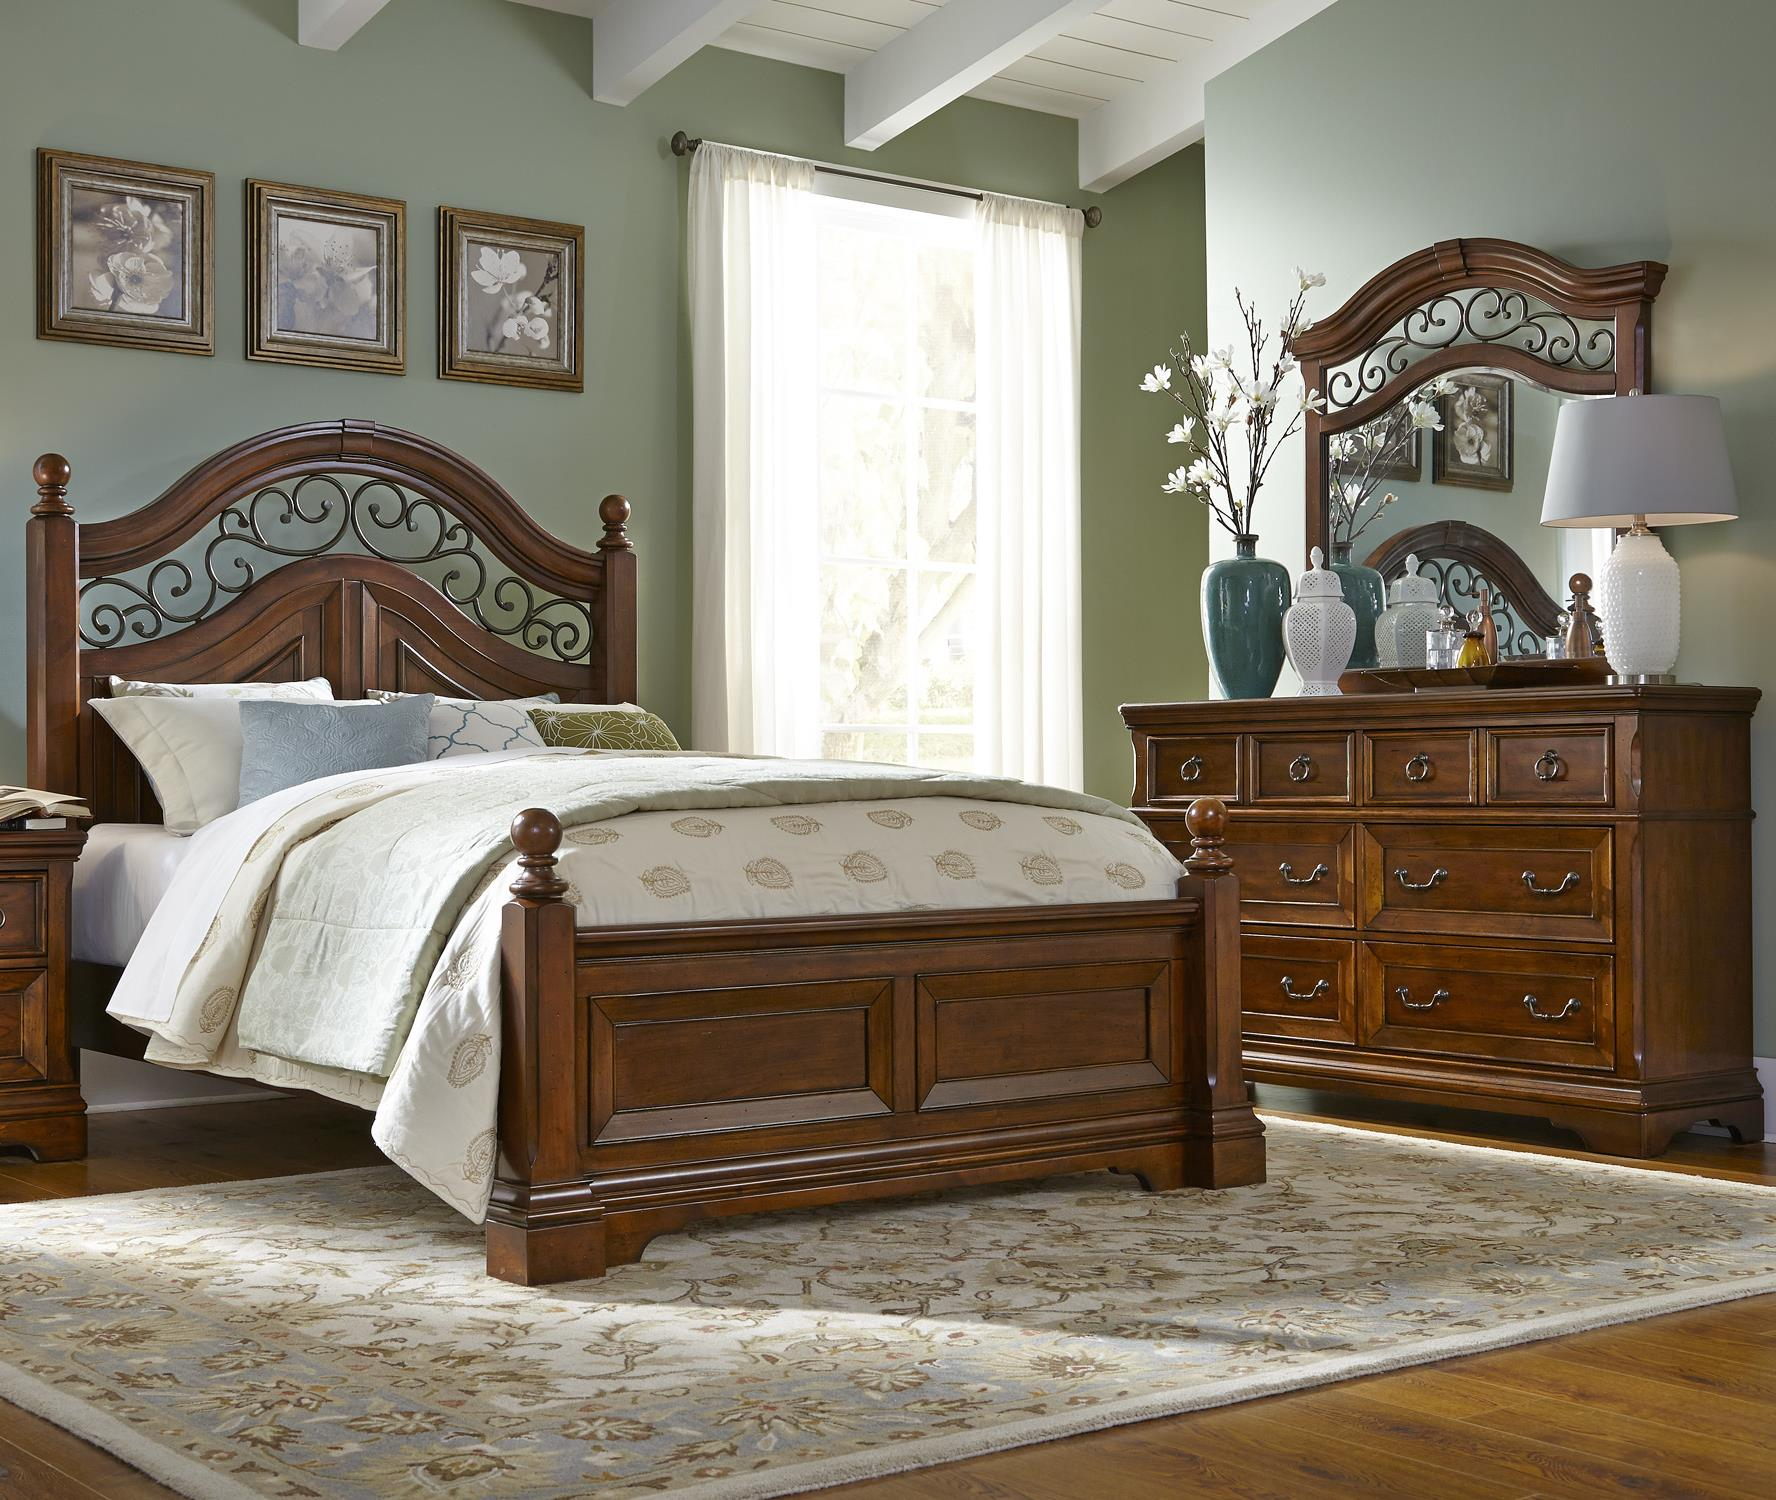 Liberty Furniture Laurelwood King Poster Bed, Dresser & Mirror - Item Number: 547-BR-GP67